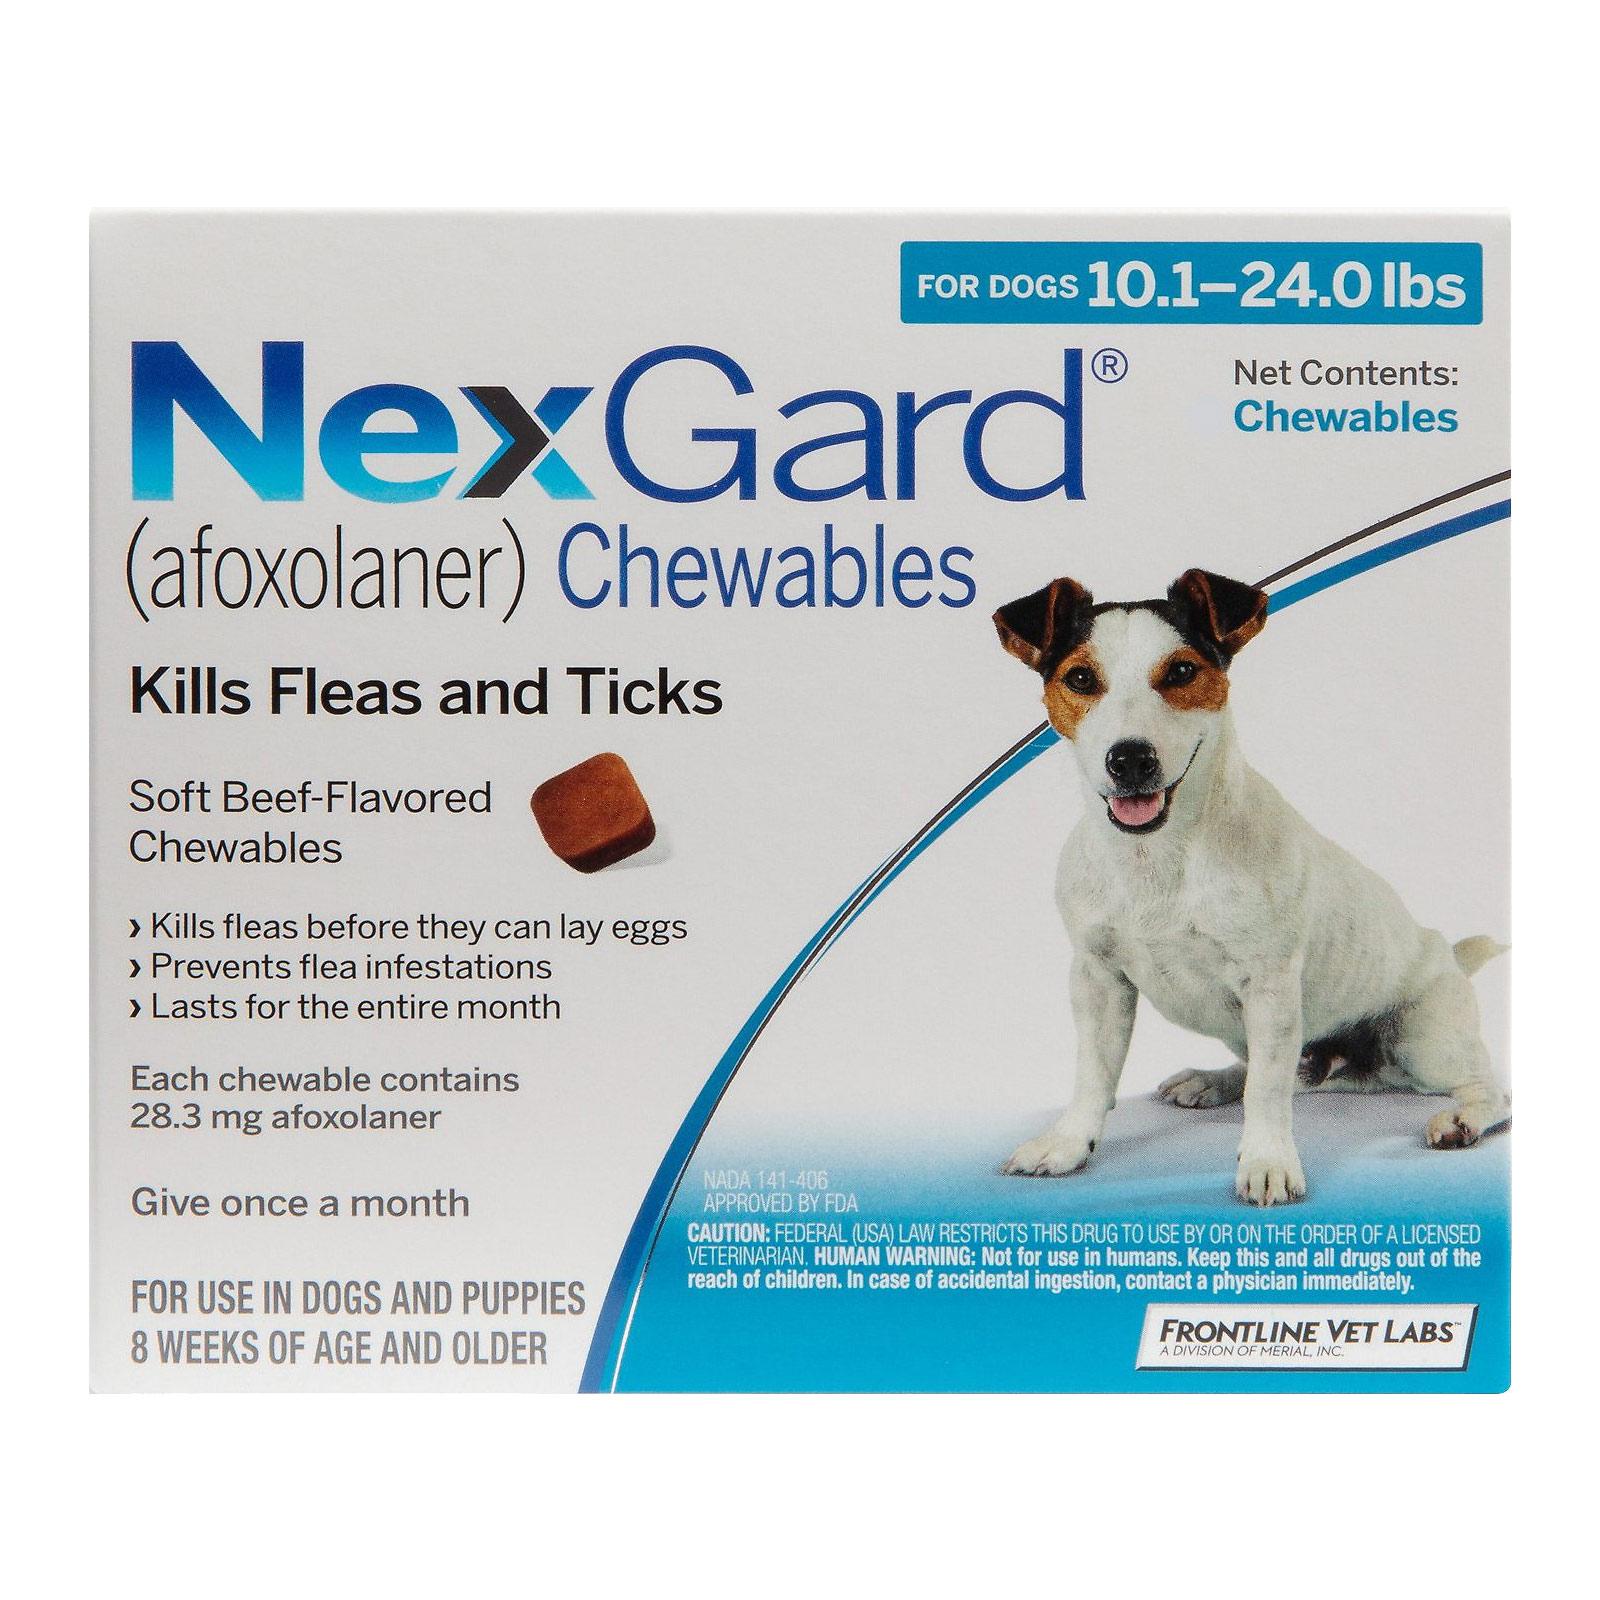 Nexgard blue